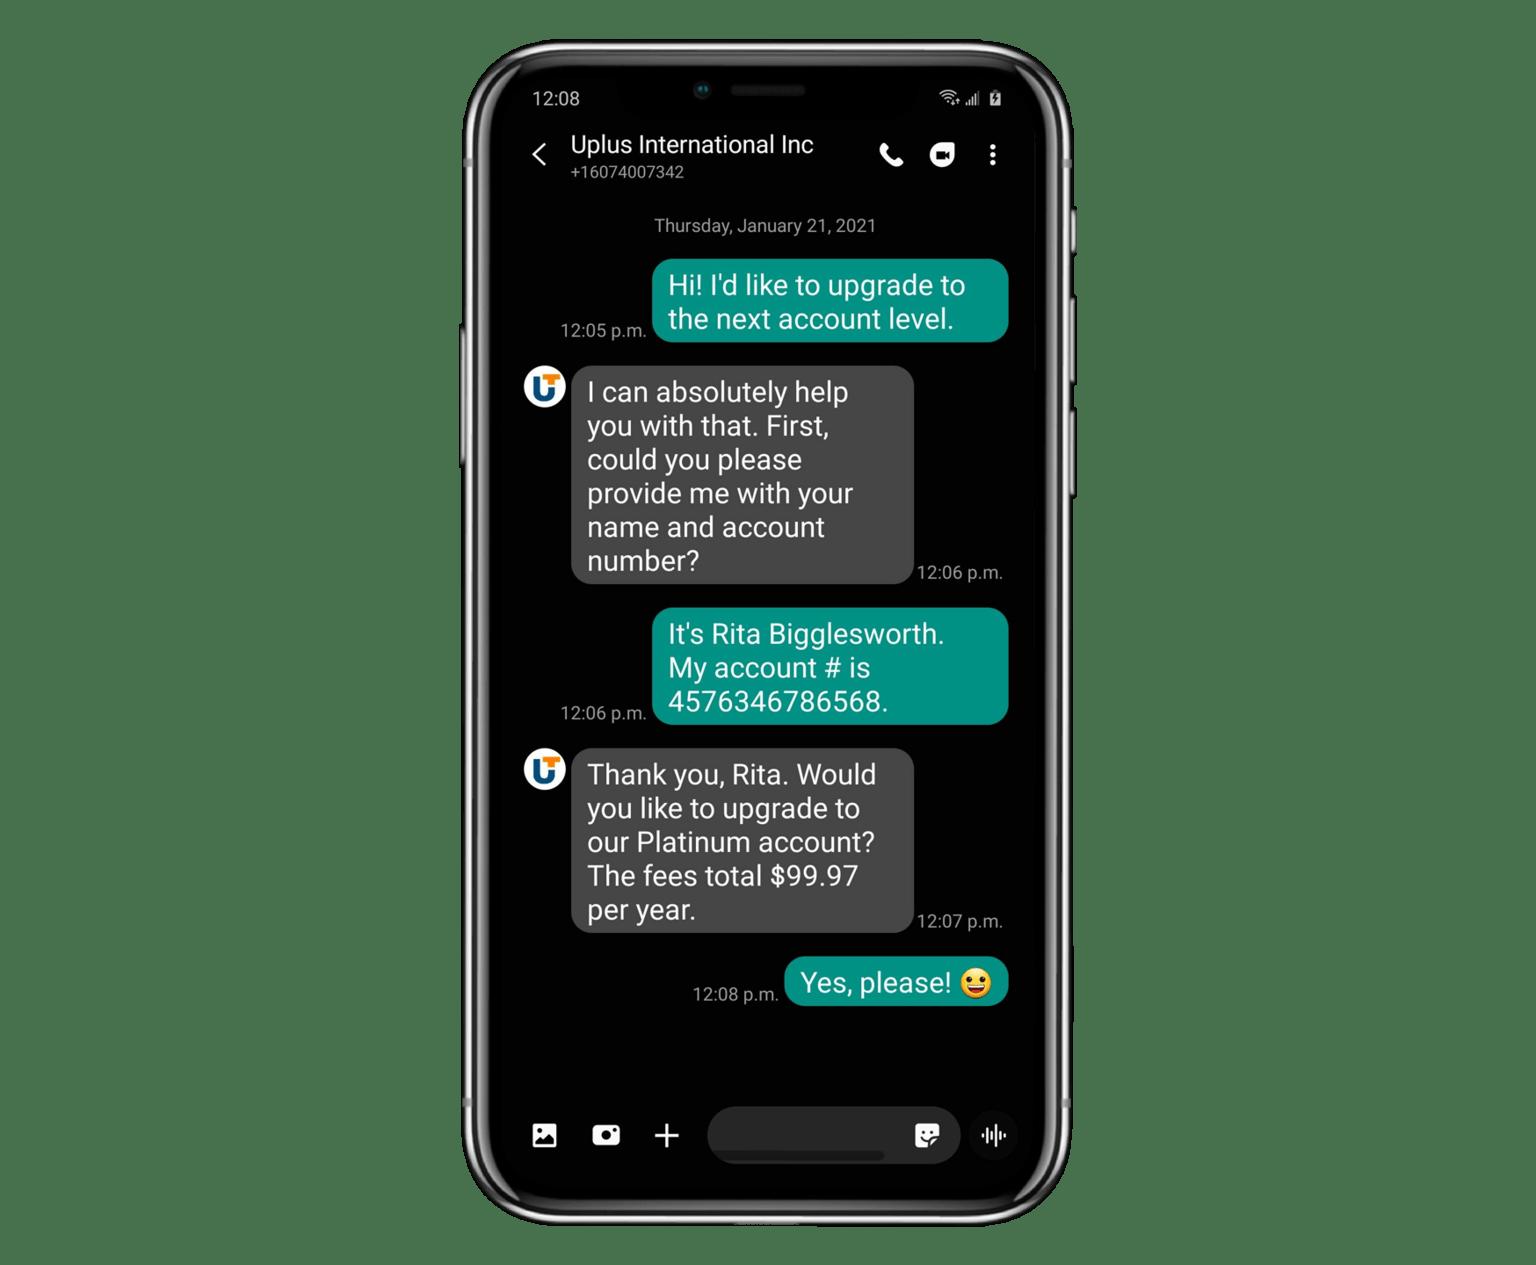 SMS chat screenshot